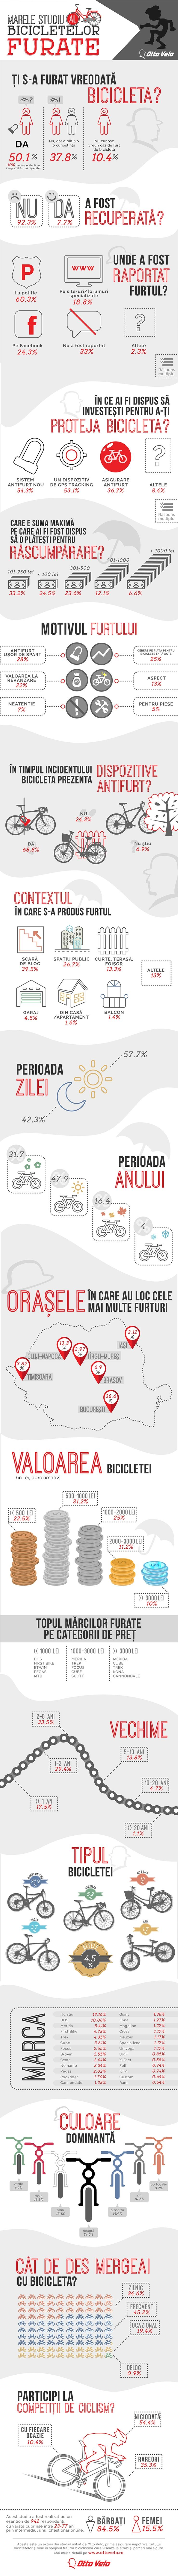 biciclete, biciclisti, furt biciclete, furt